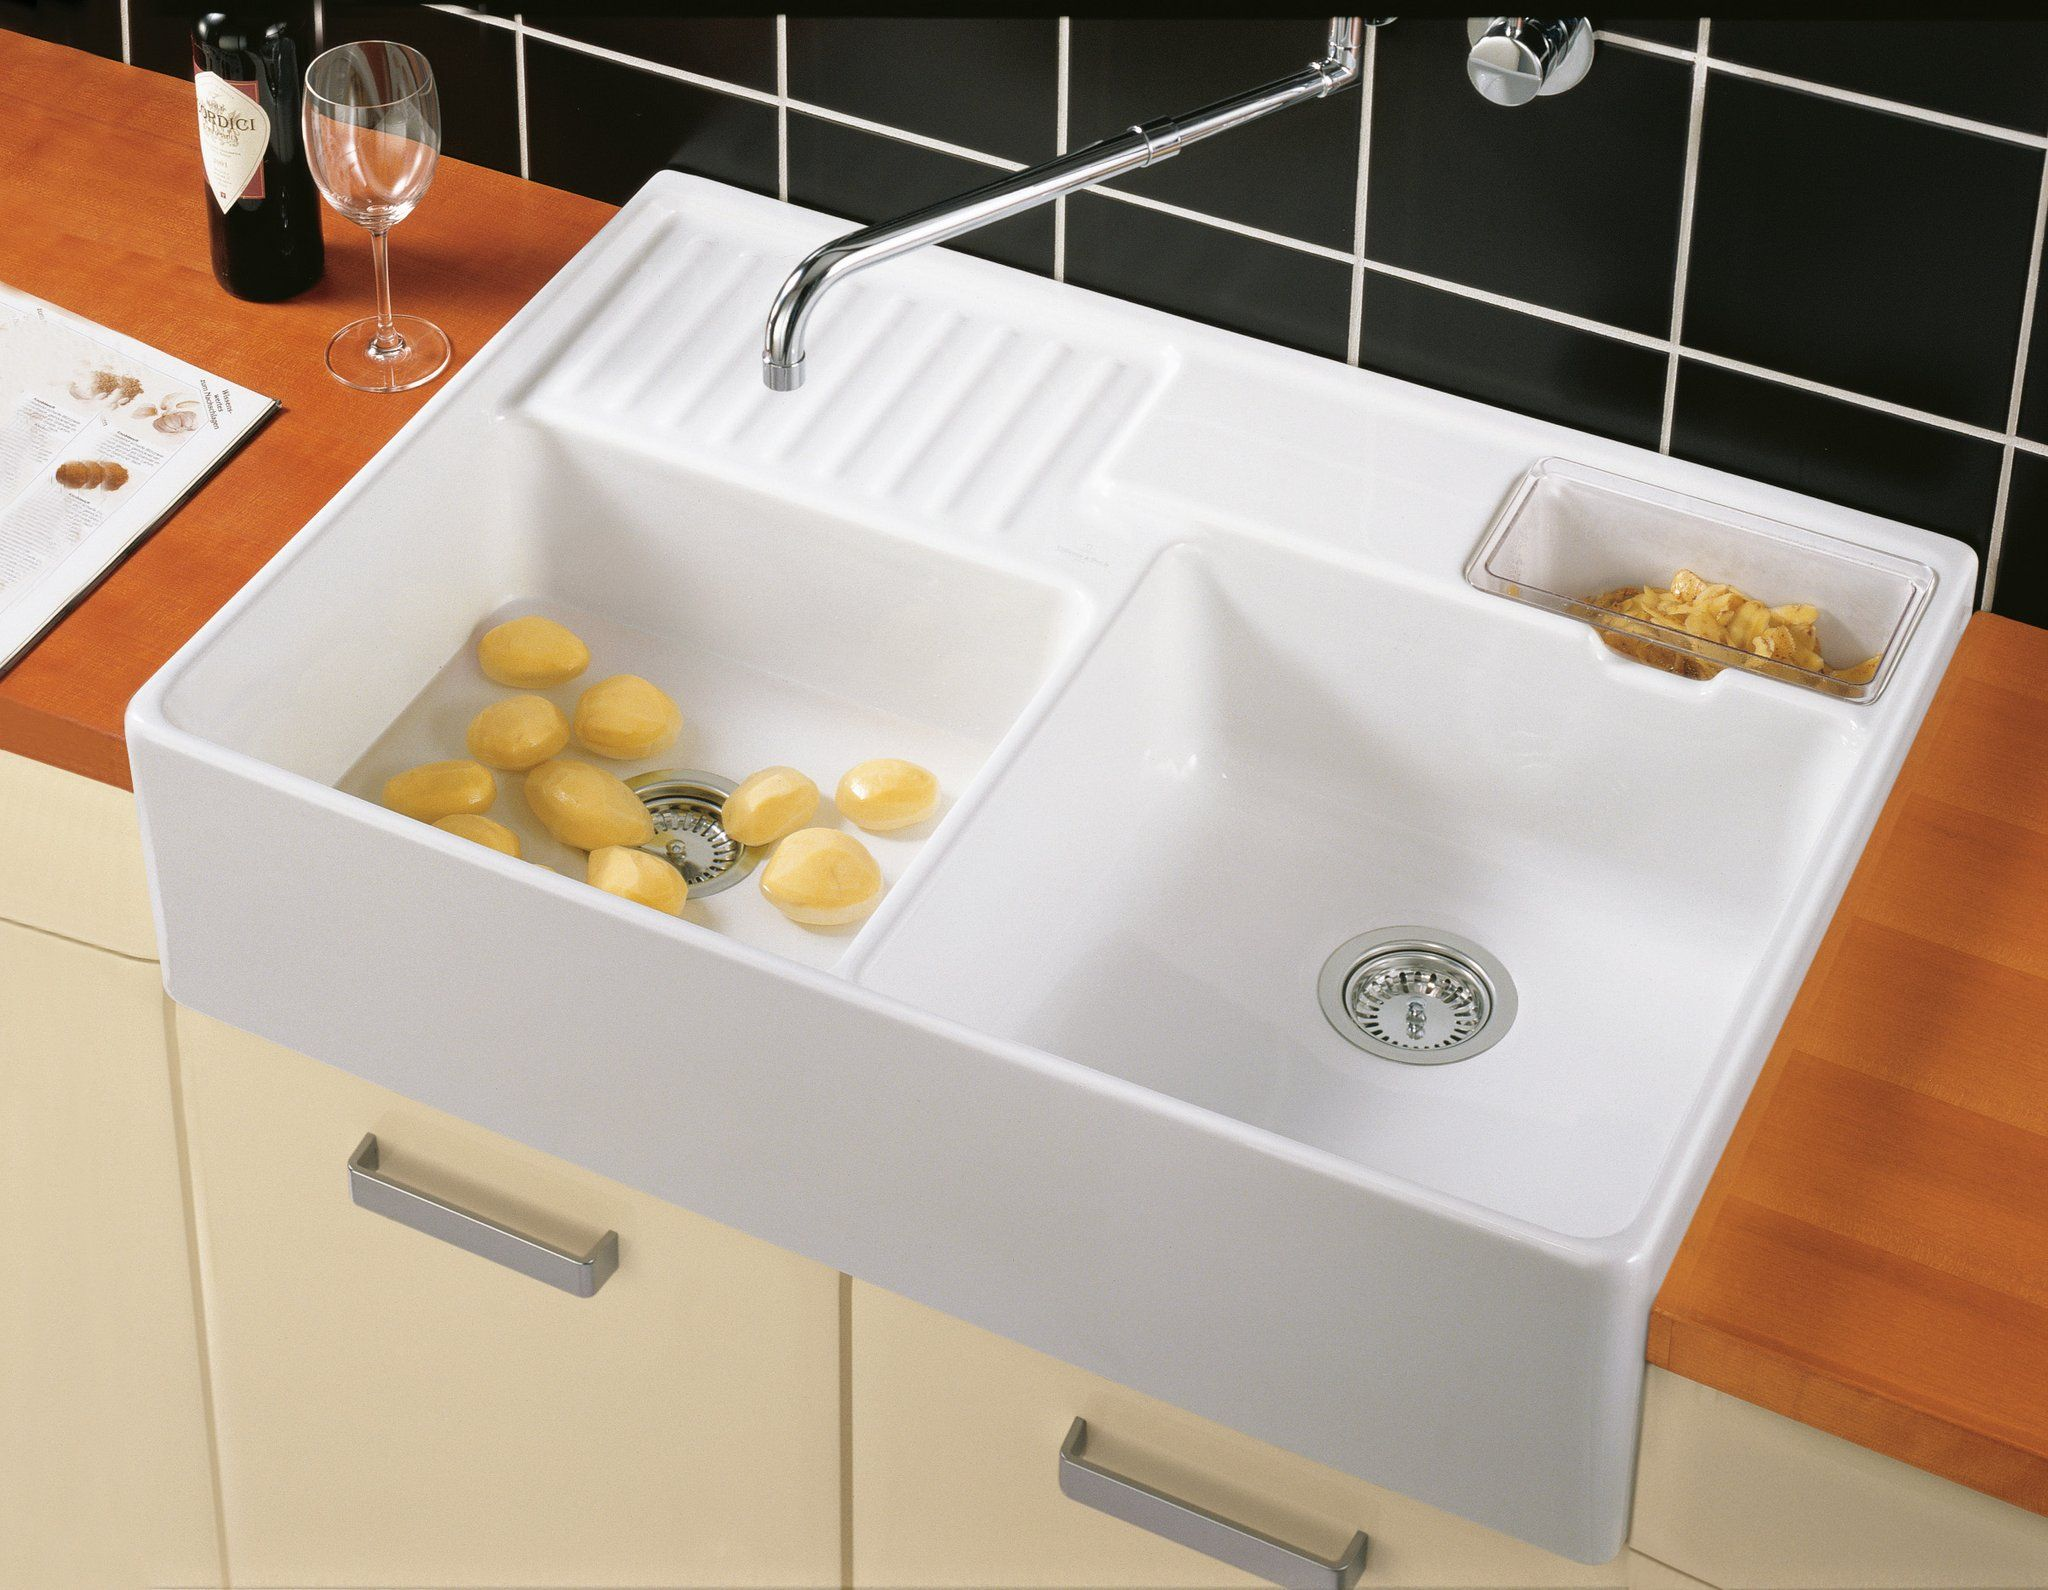 Sink Unit Double Bowl Sink 632391 Villeroy Boch Ceramic Kitchen Sinks Double Kitchen Sink Kitchen Sink Decor